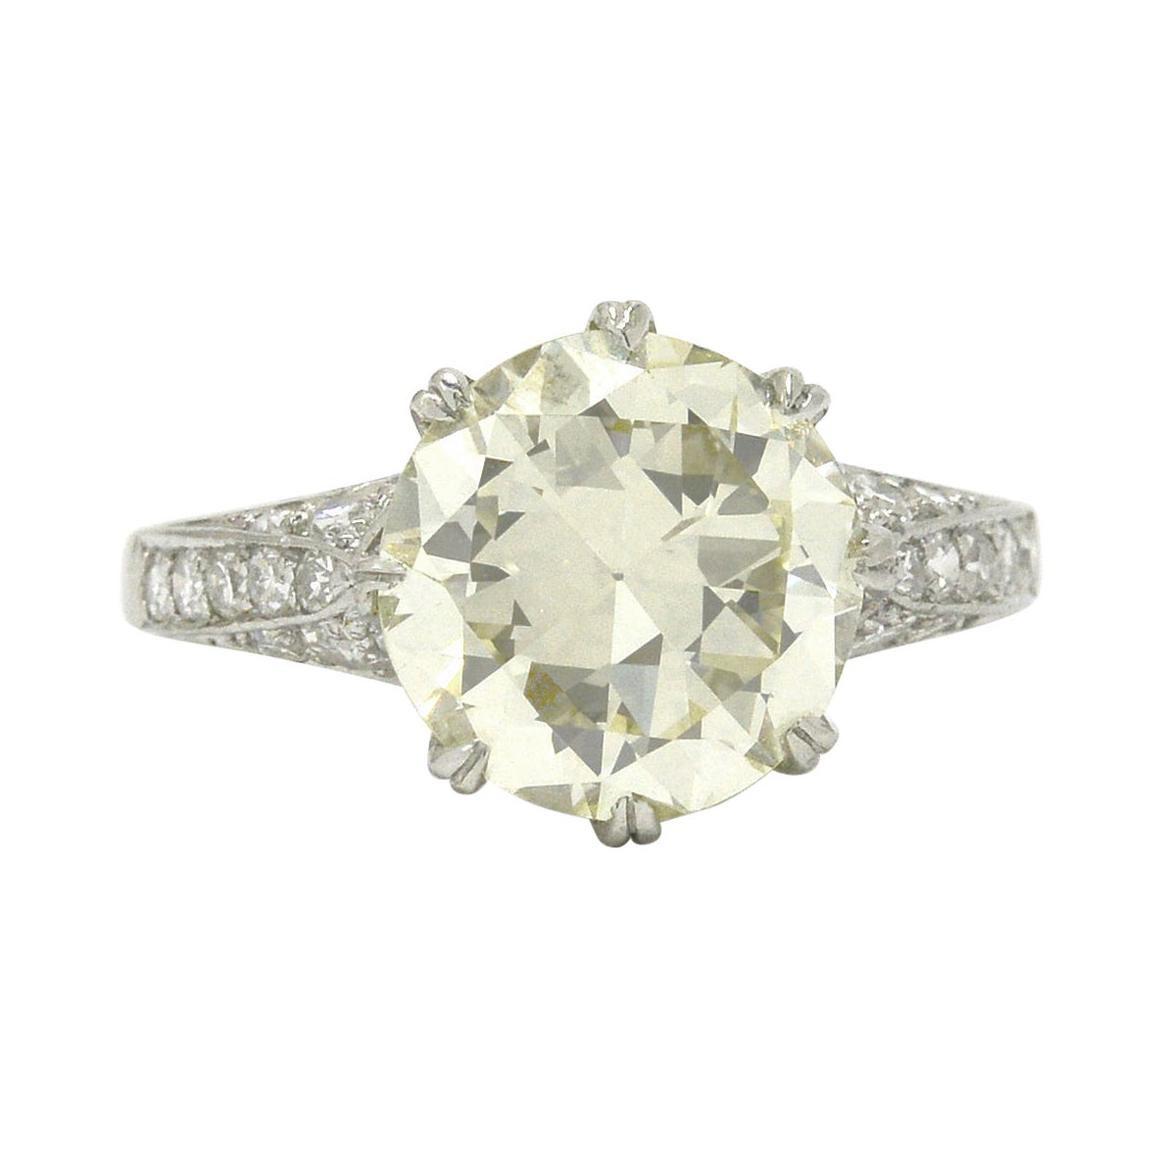 Antique Edwardian 4 Carat Solitaire Diamond Engagement Ring Old European Cut